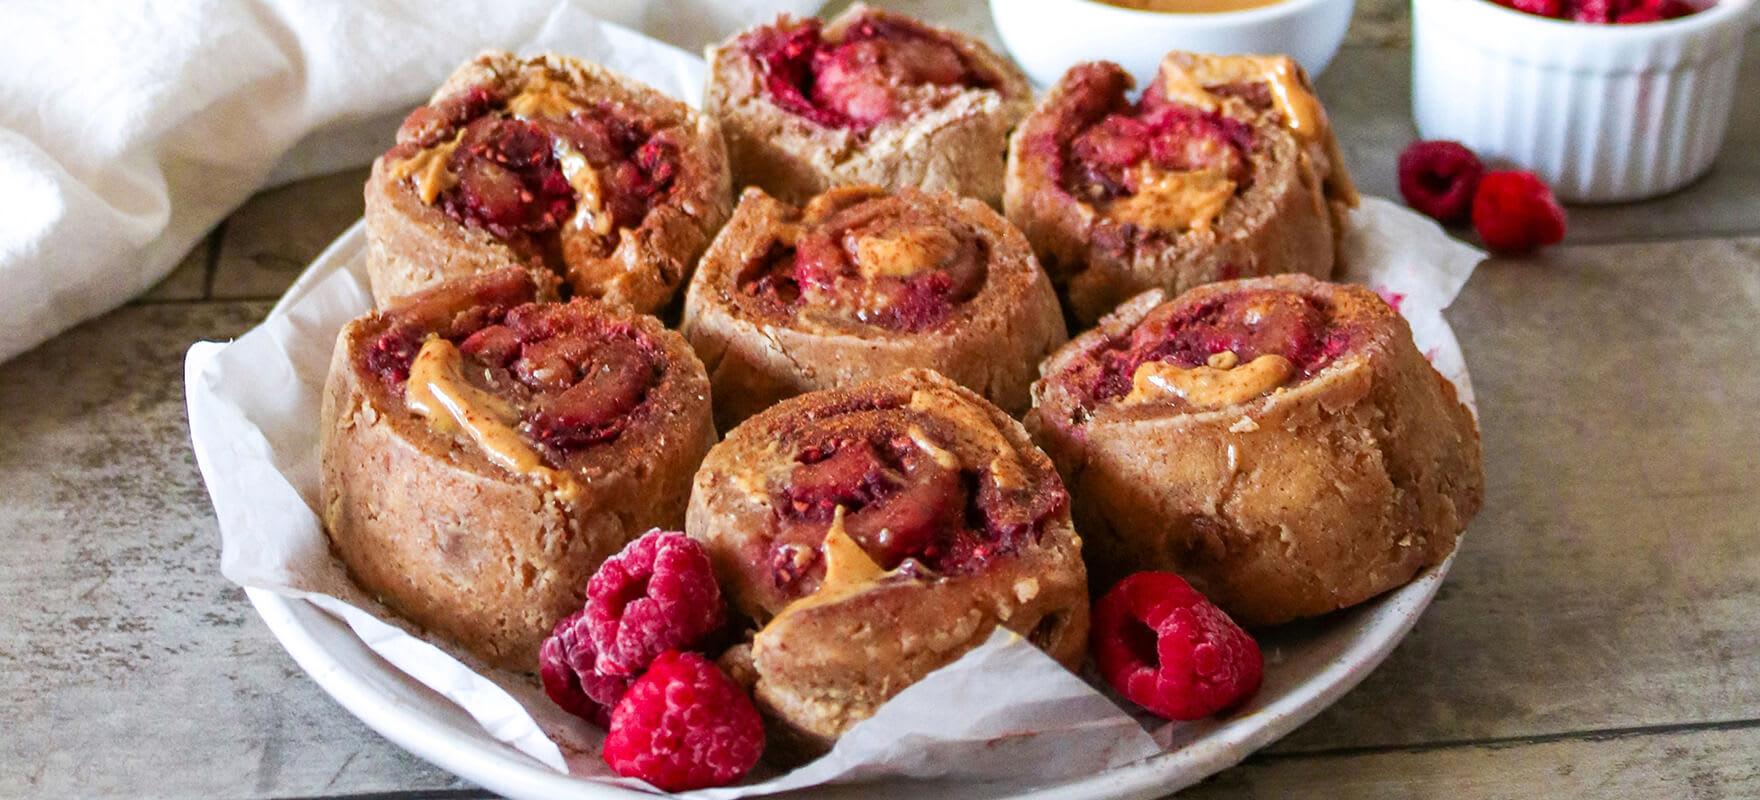 Mini gluten free peanut butter & jelly scrolls image 1